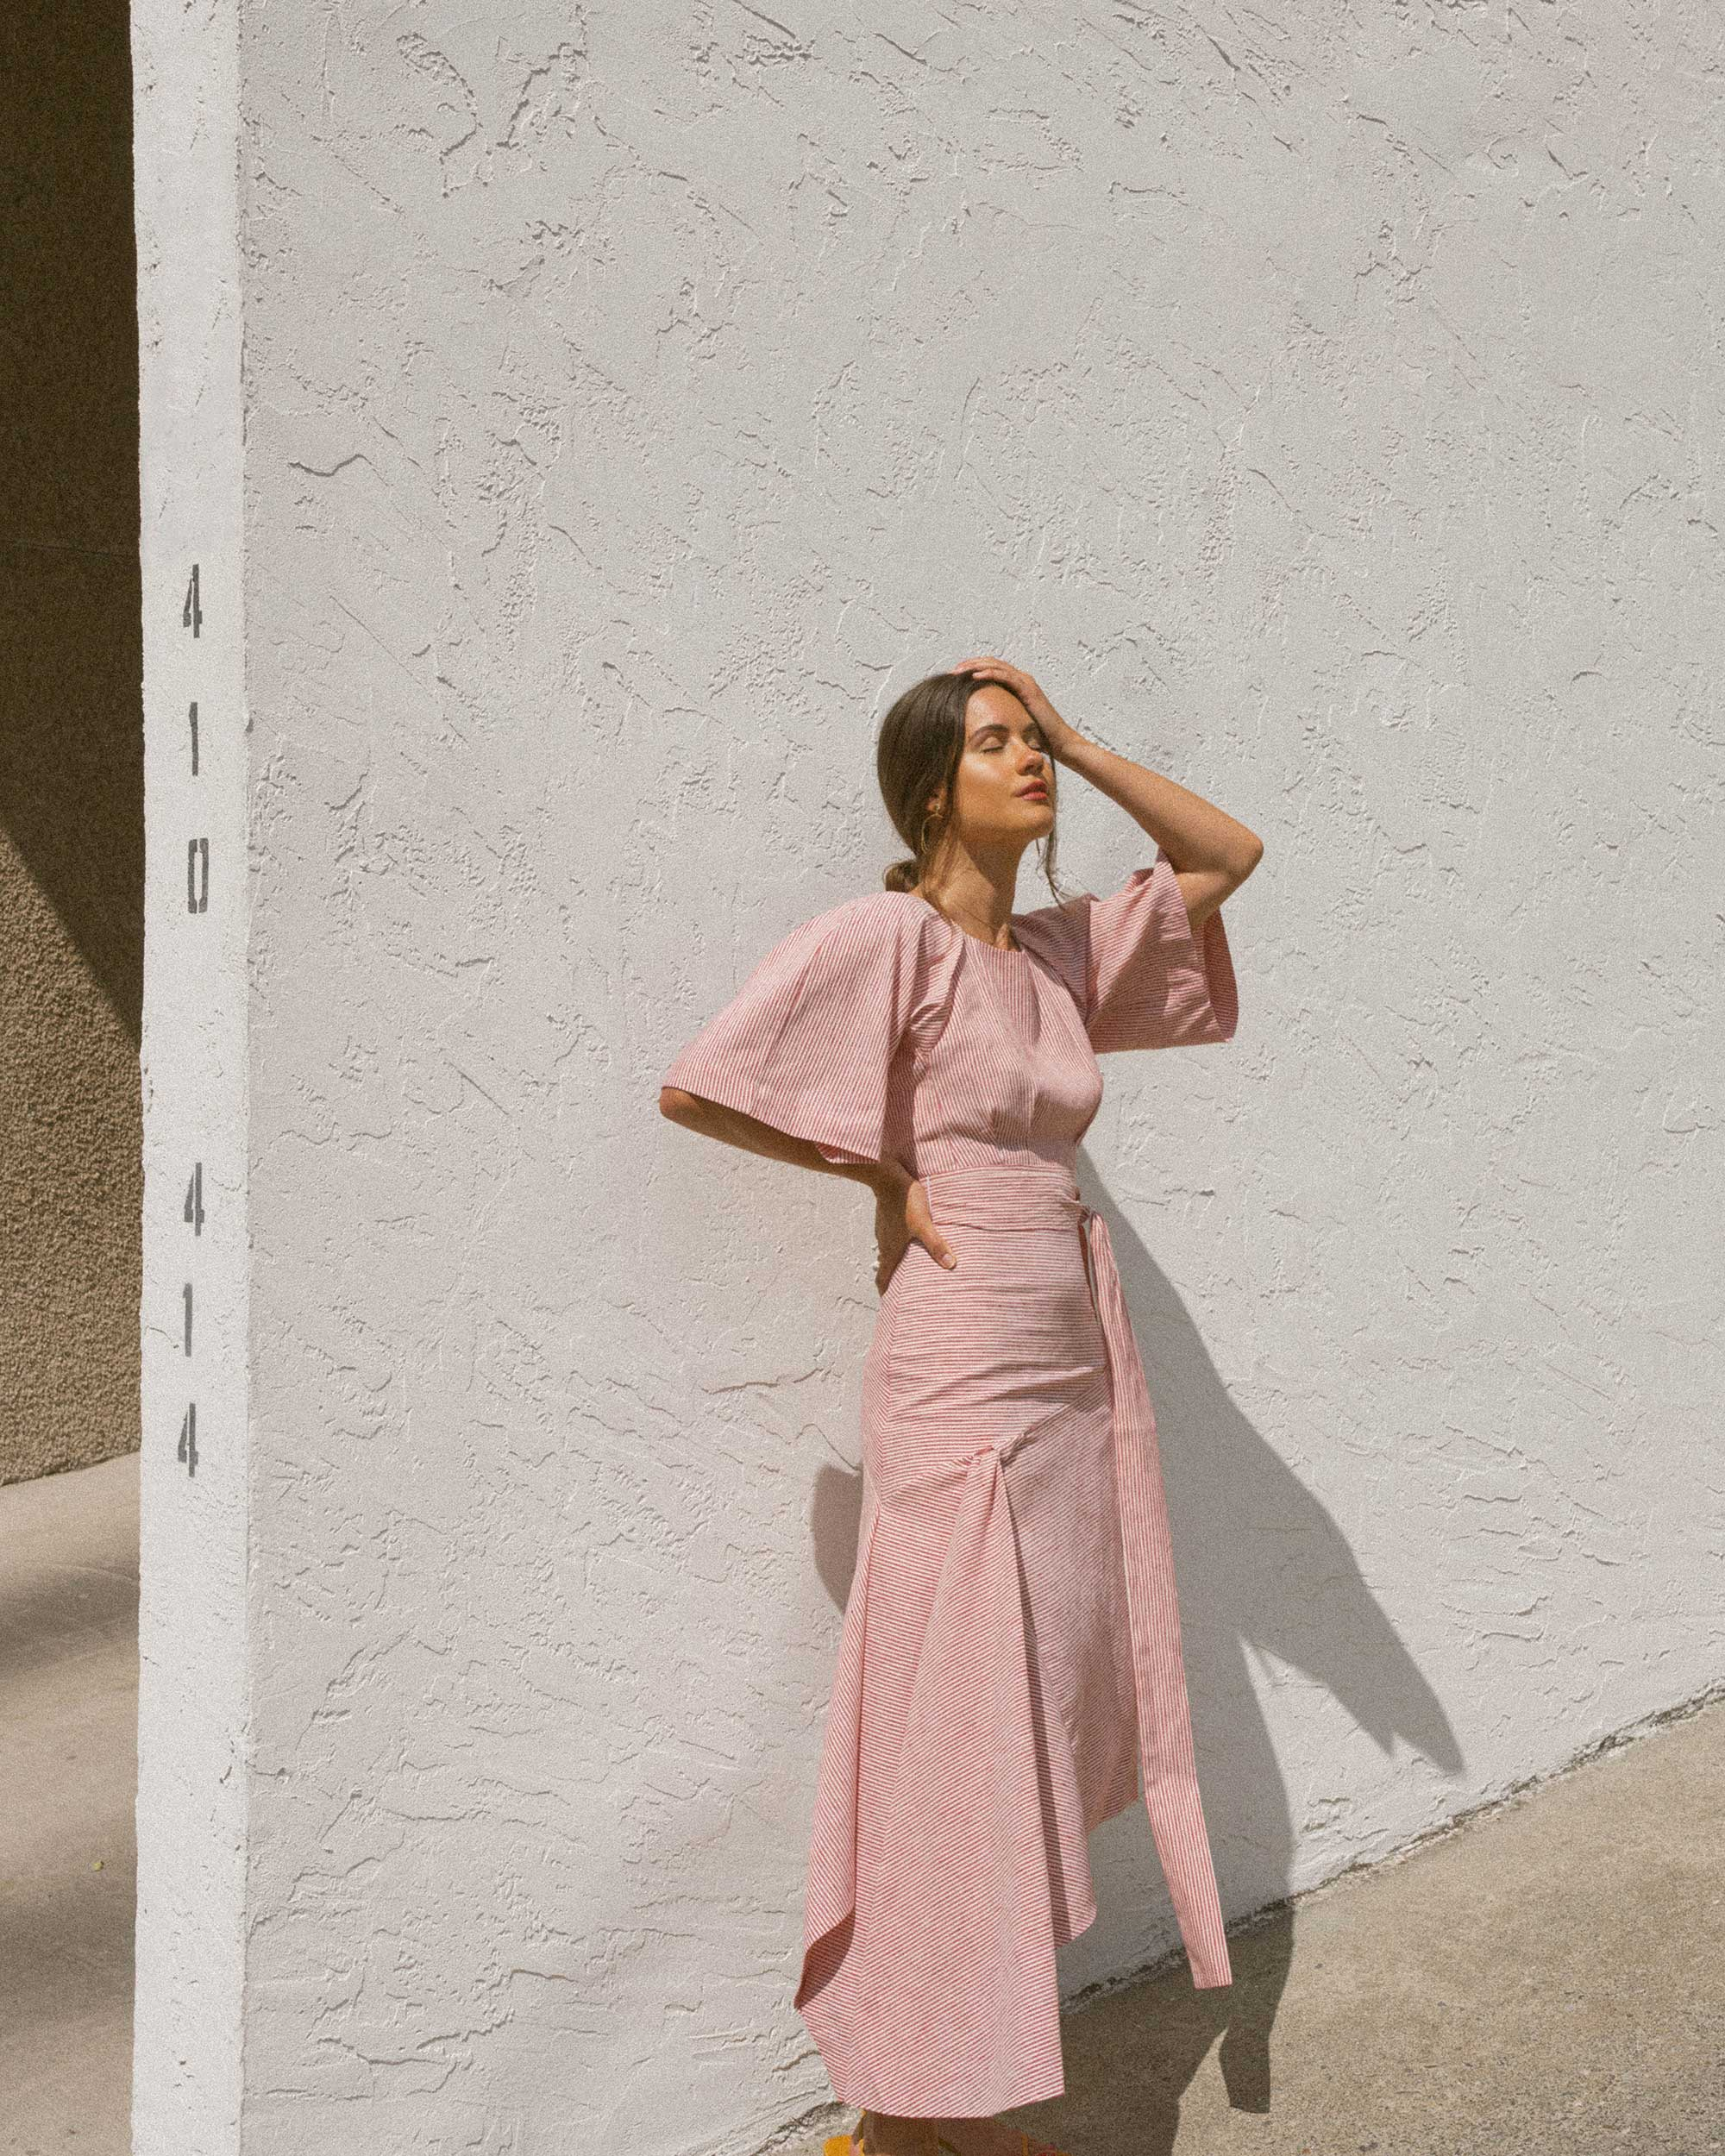 Sarah Butler of Sarah Styles wears BcbgMaxAzria Pinstripe Asymmetric Skirt and Pinstripe Cutout Back Cropped Top in Seattle   @sarahchristine -6.jpg